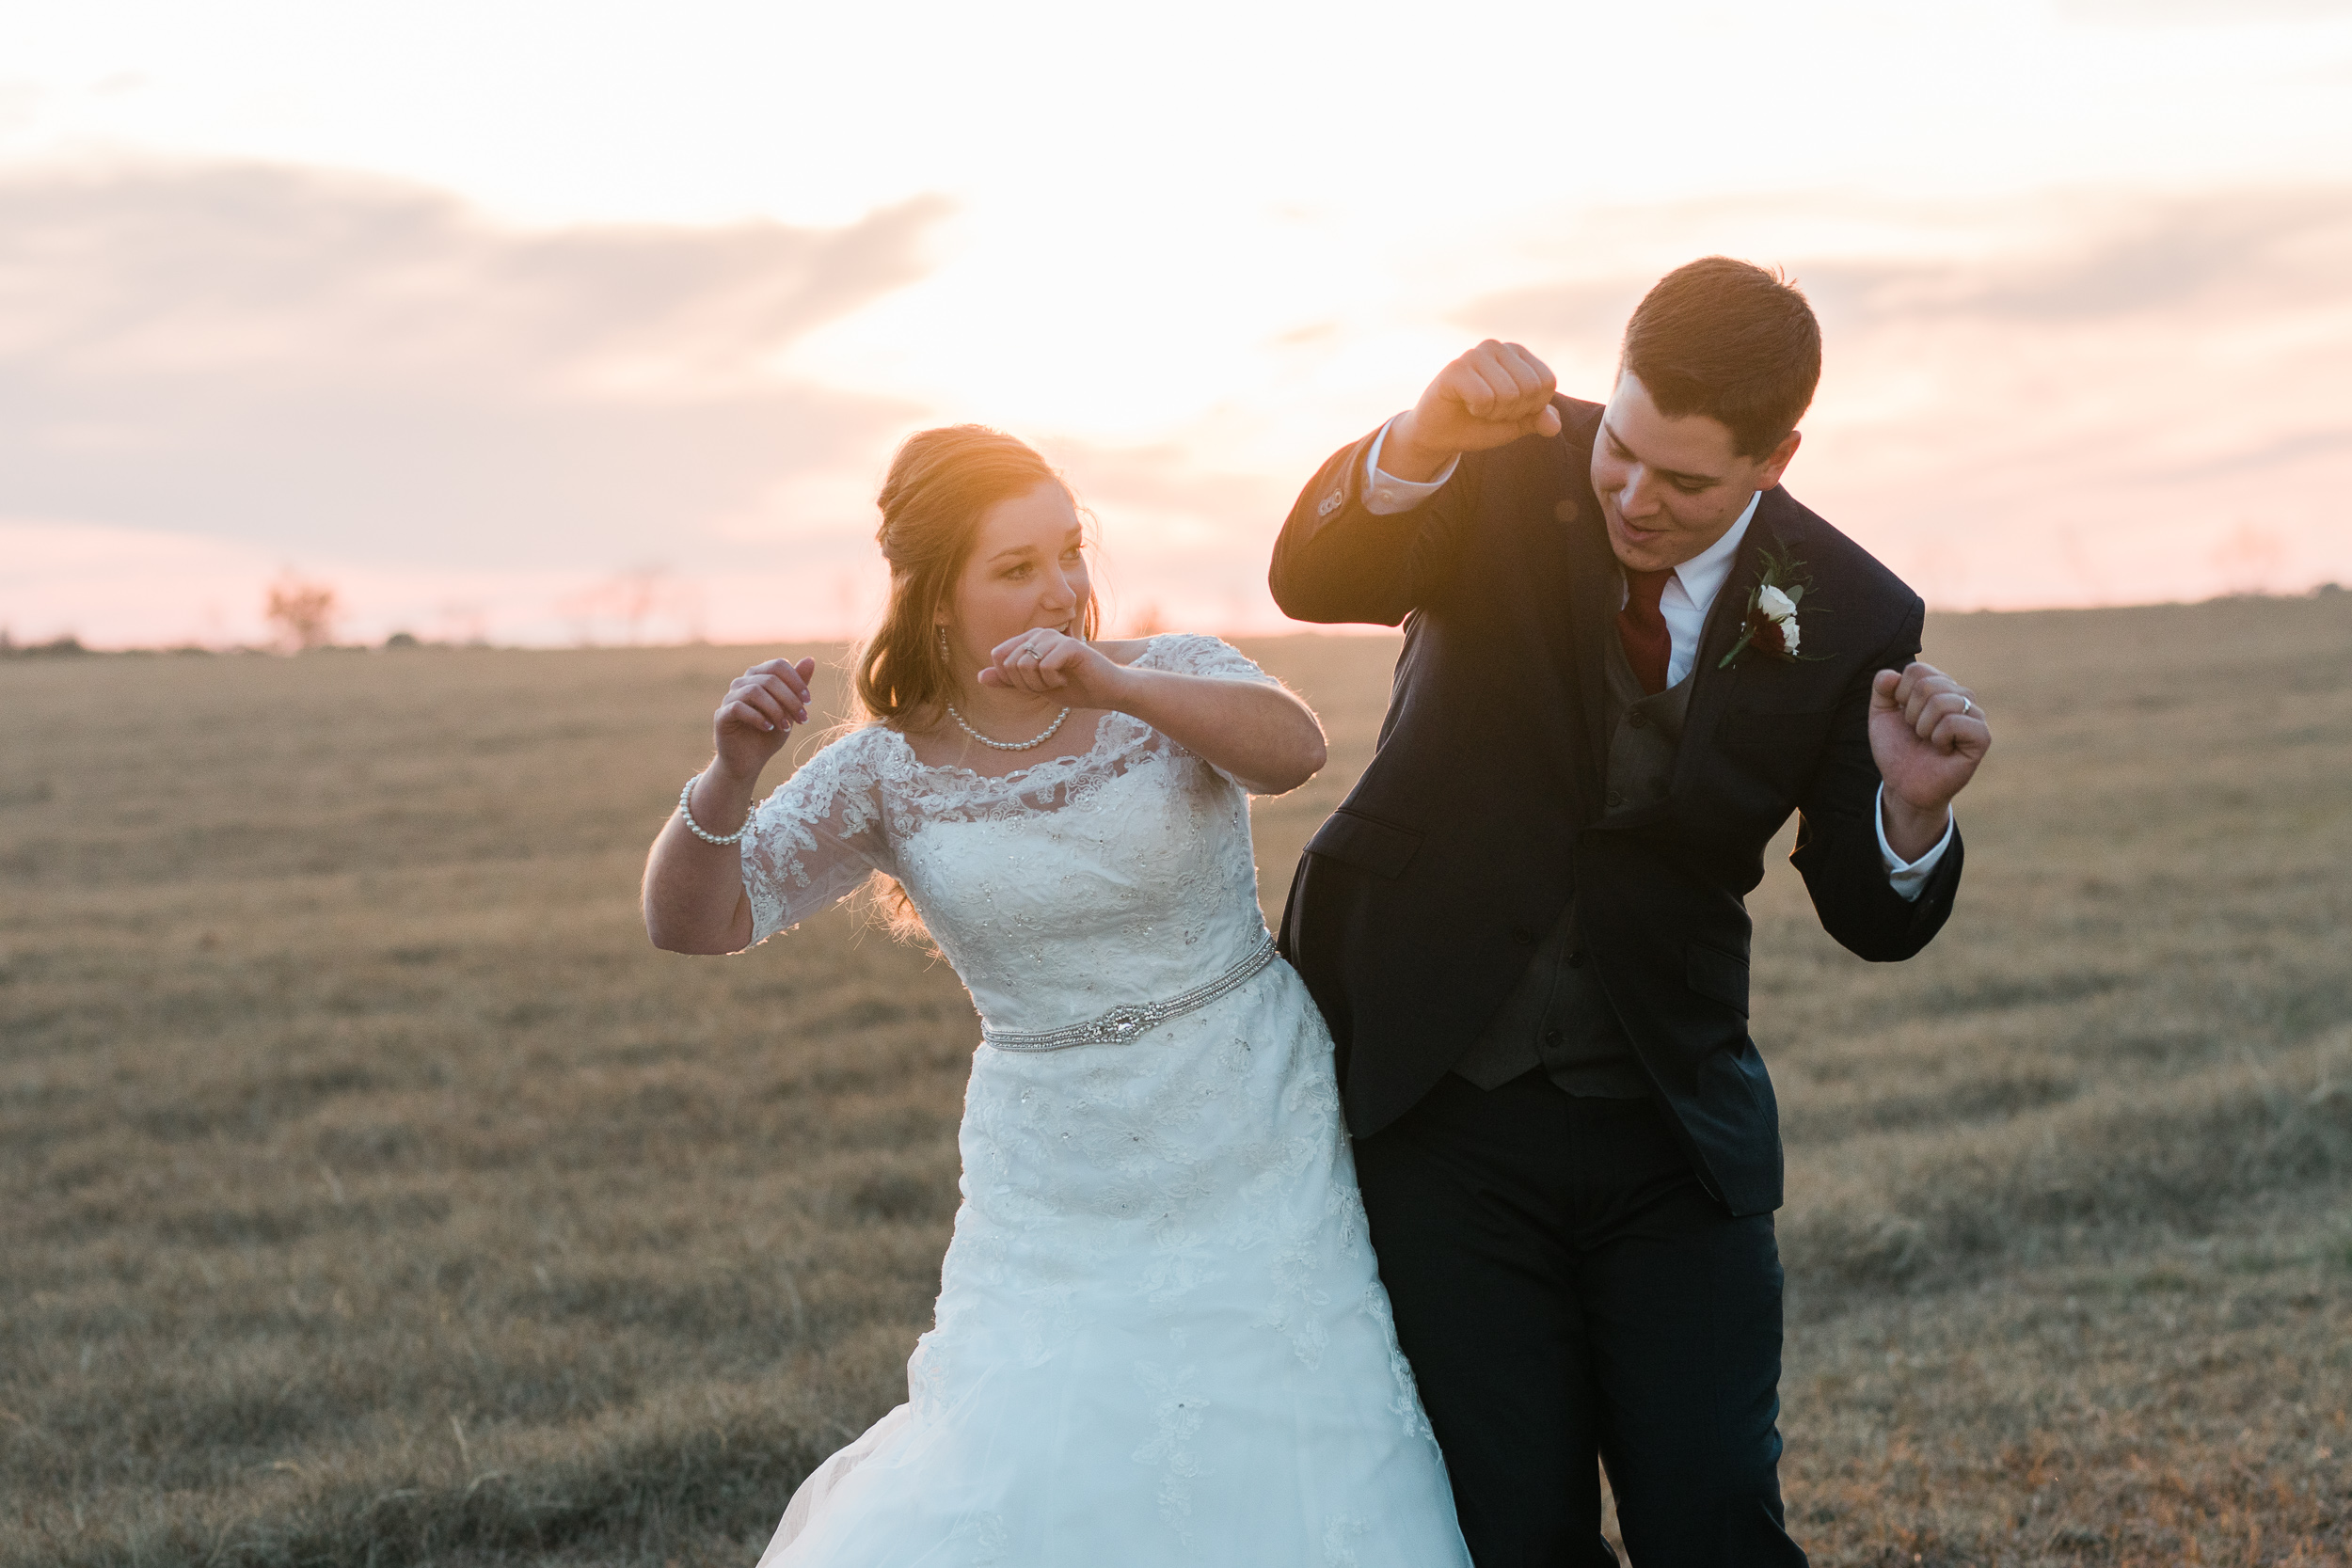 Sarah_Danielle_Portraits_Wedding_Photographer_Alachua_Fl_Waldo_Wedding_Excited